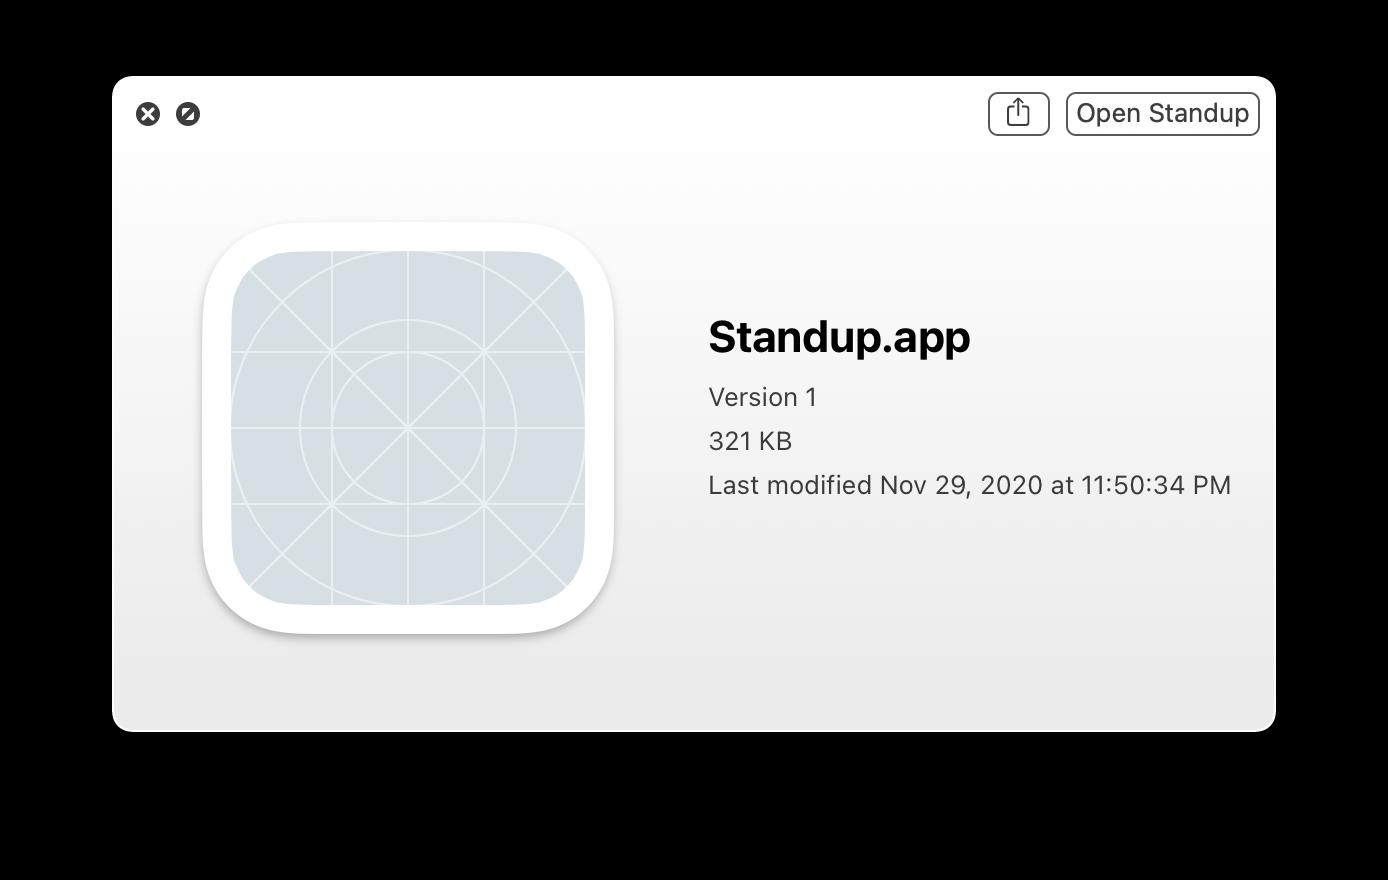 Standup.app